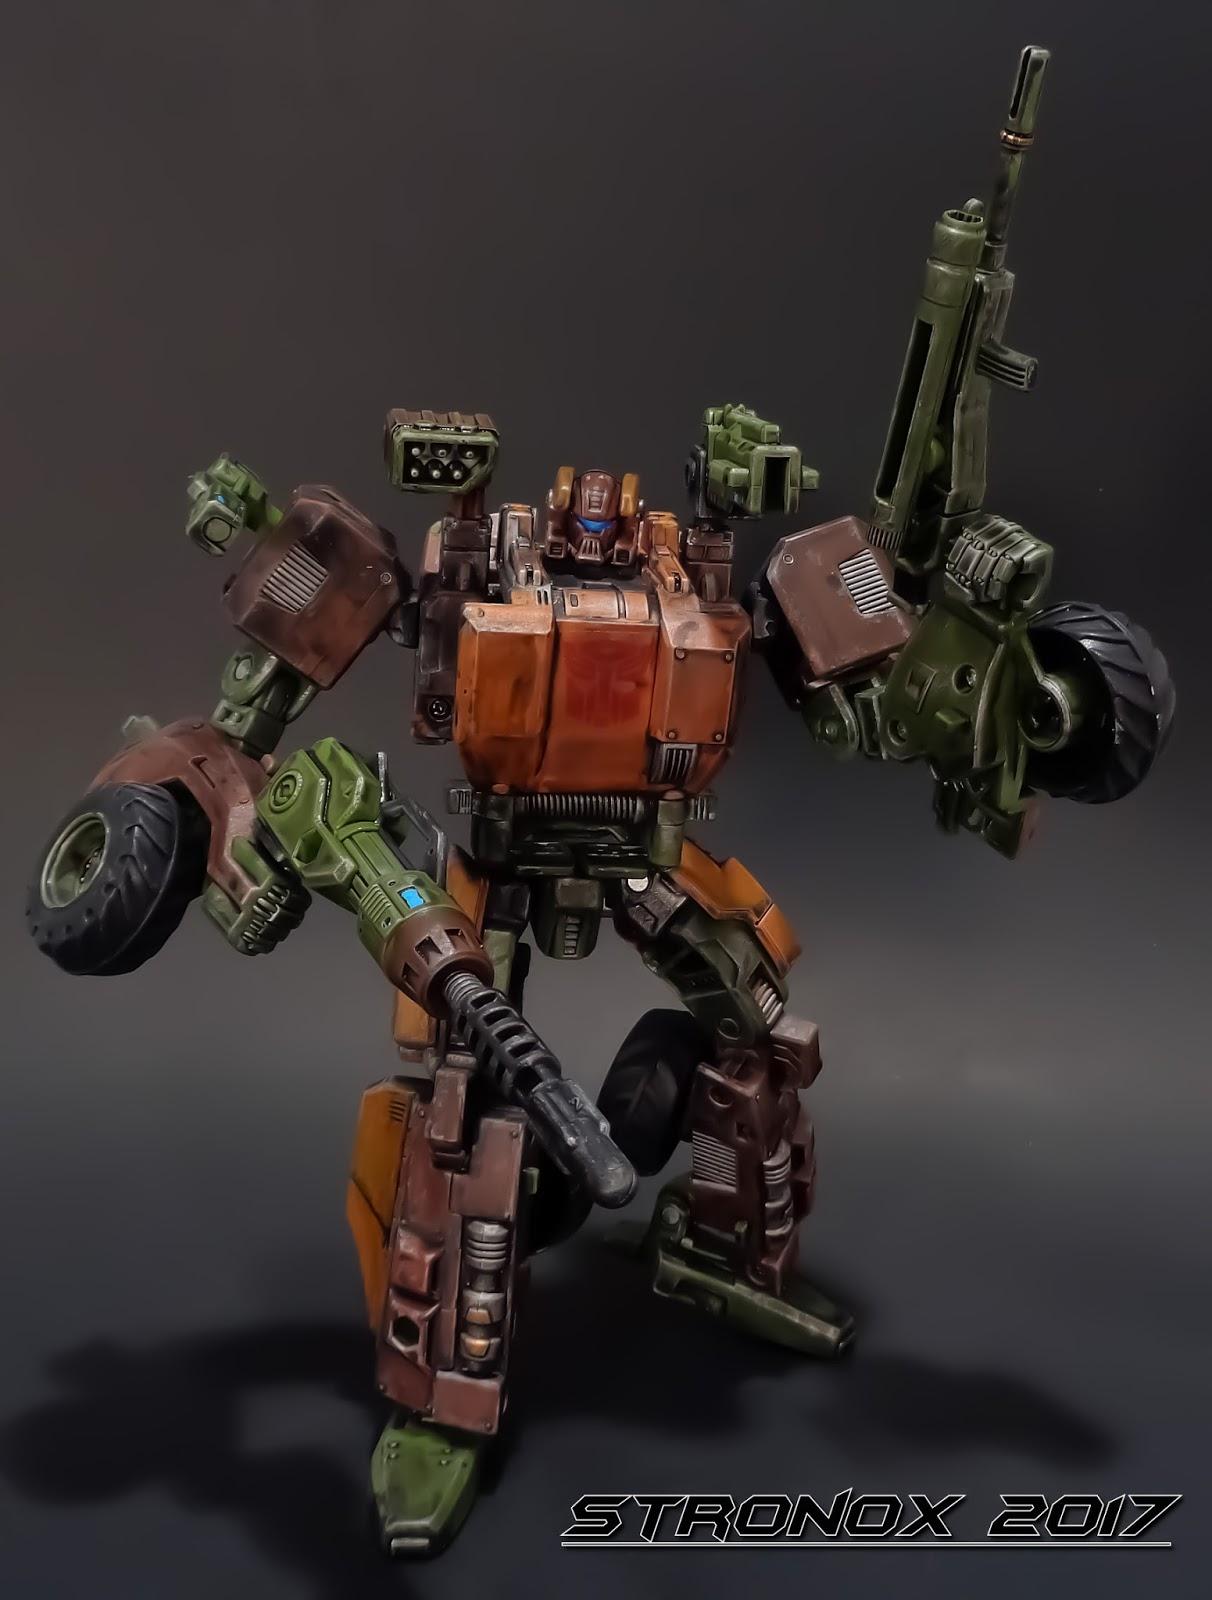 Stronox Custom Figures: Transformers: Roadbuster